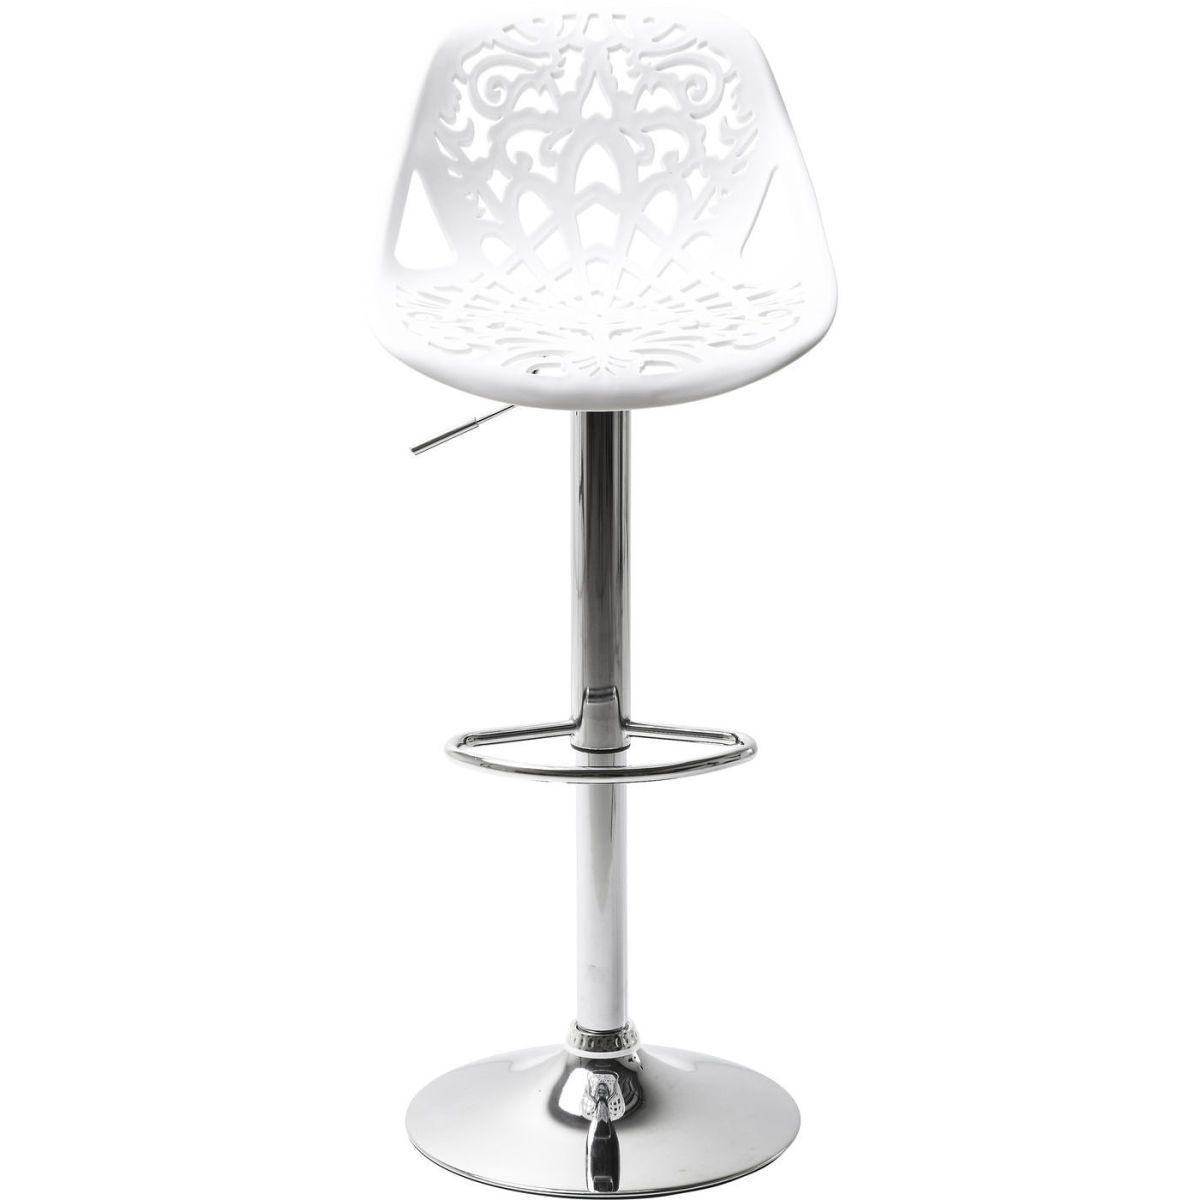 Barhocker Ornament White Jetzt bestellen unter: https://moebel ...